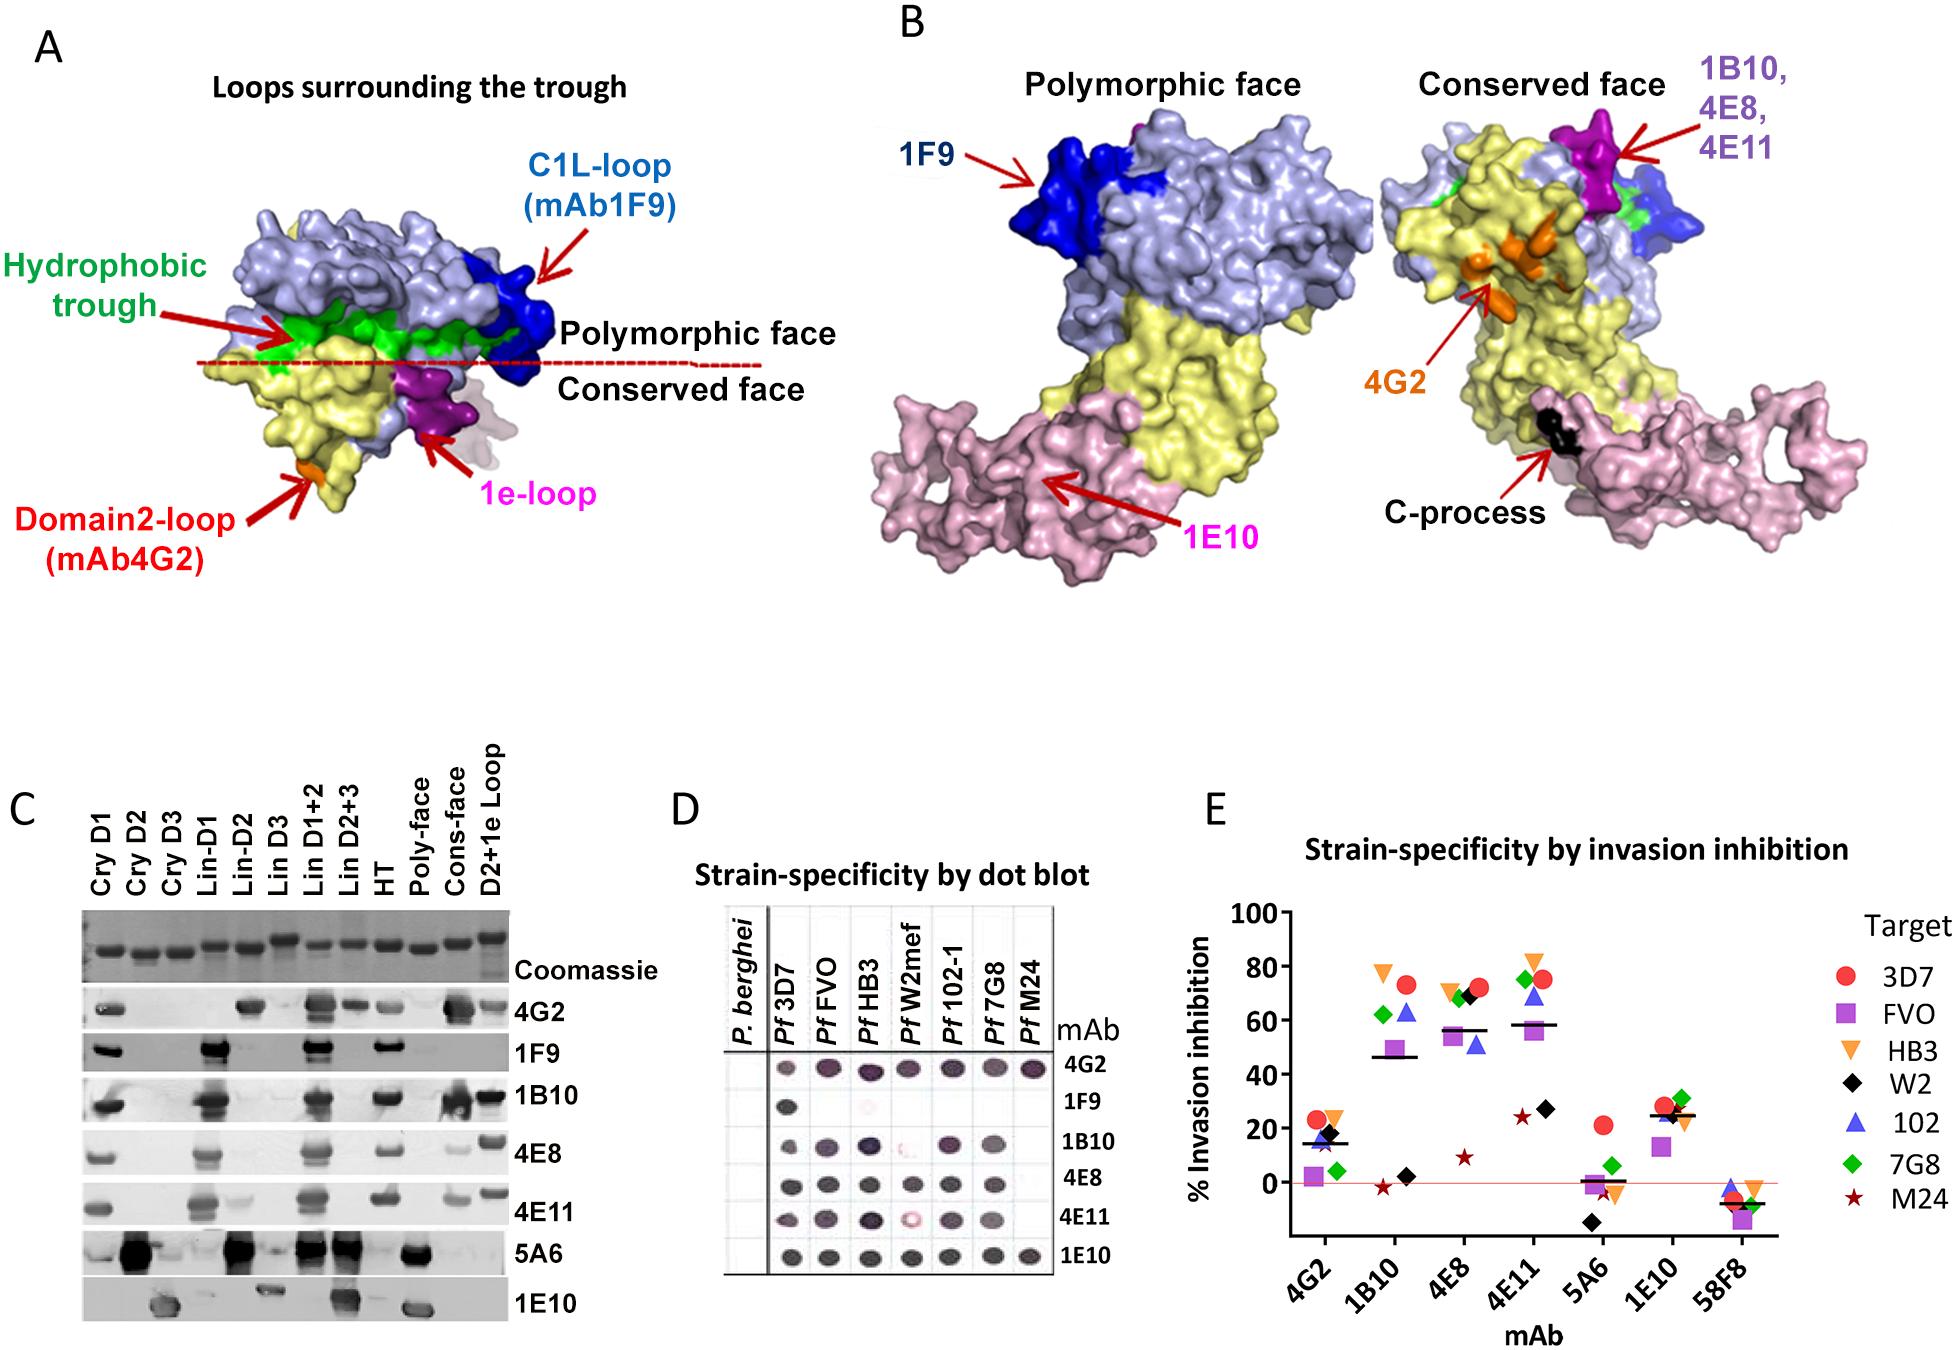 Mapping inhibitory monoclonal antibodies.